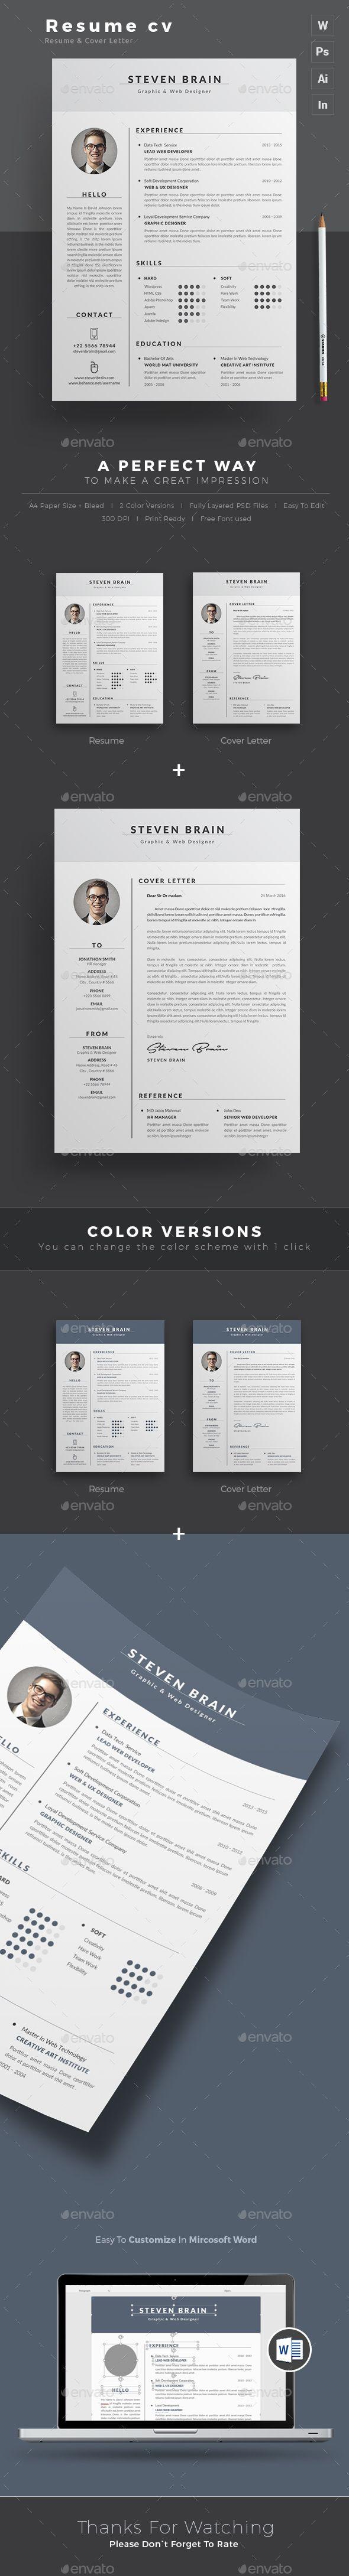 word processor resume resume cv cover letter